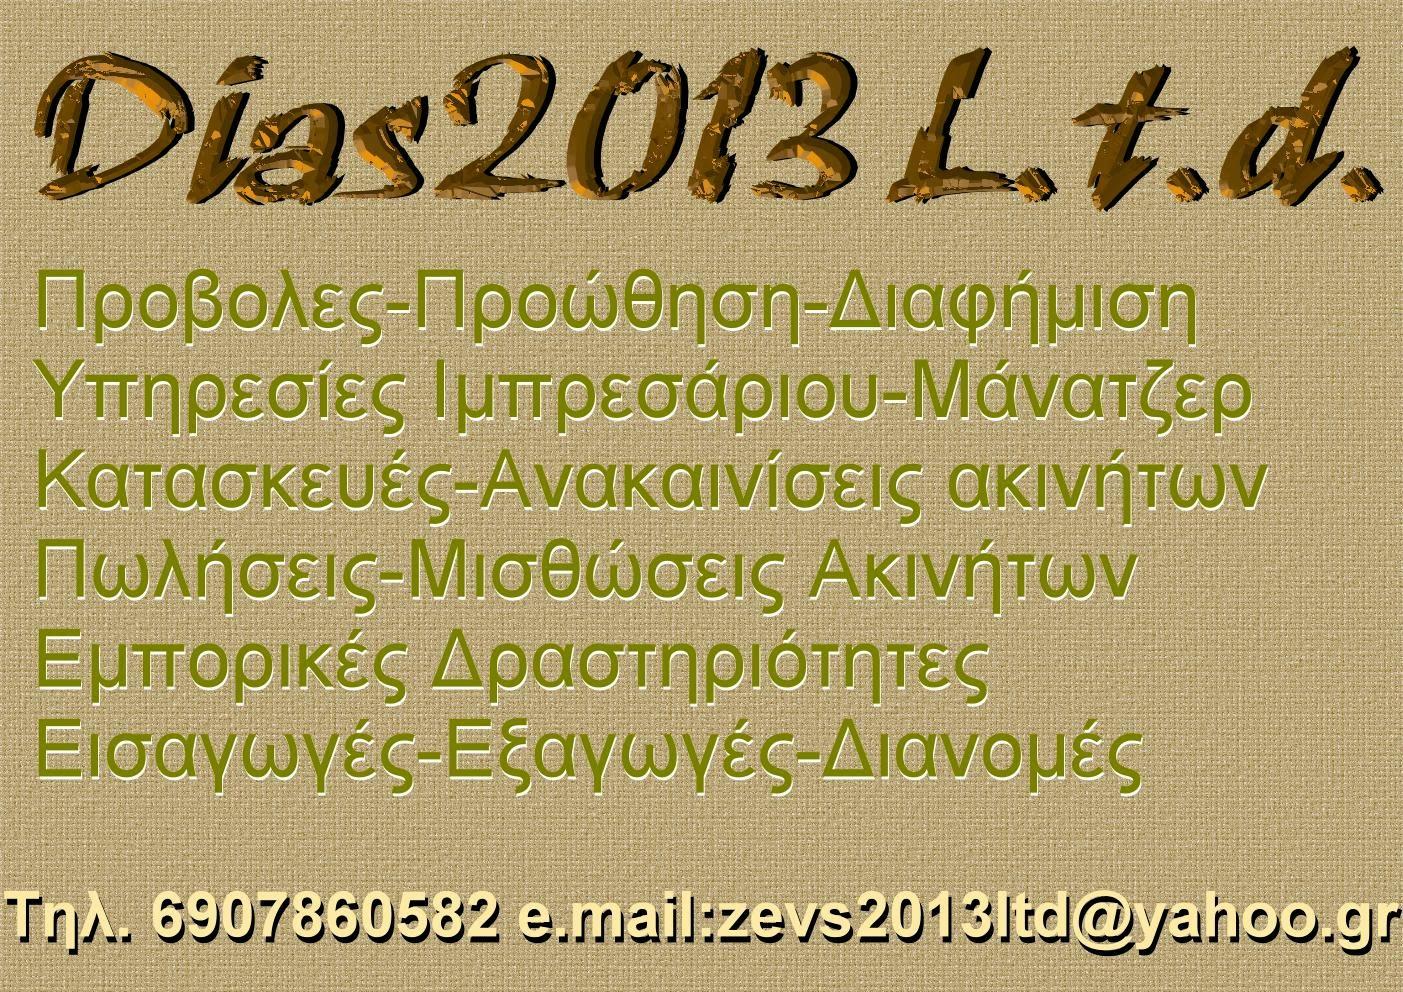 DIAS2013 LTD